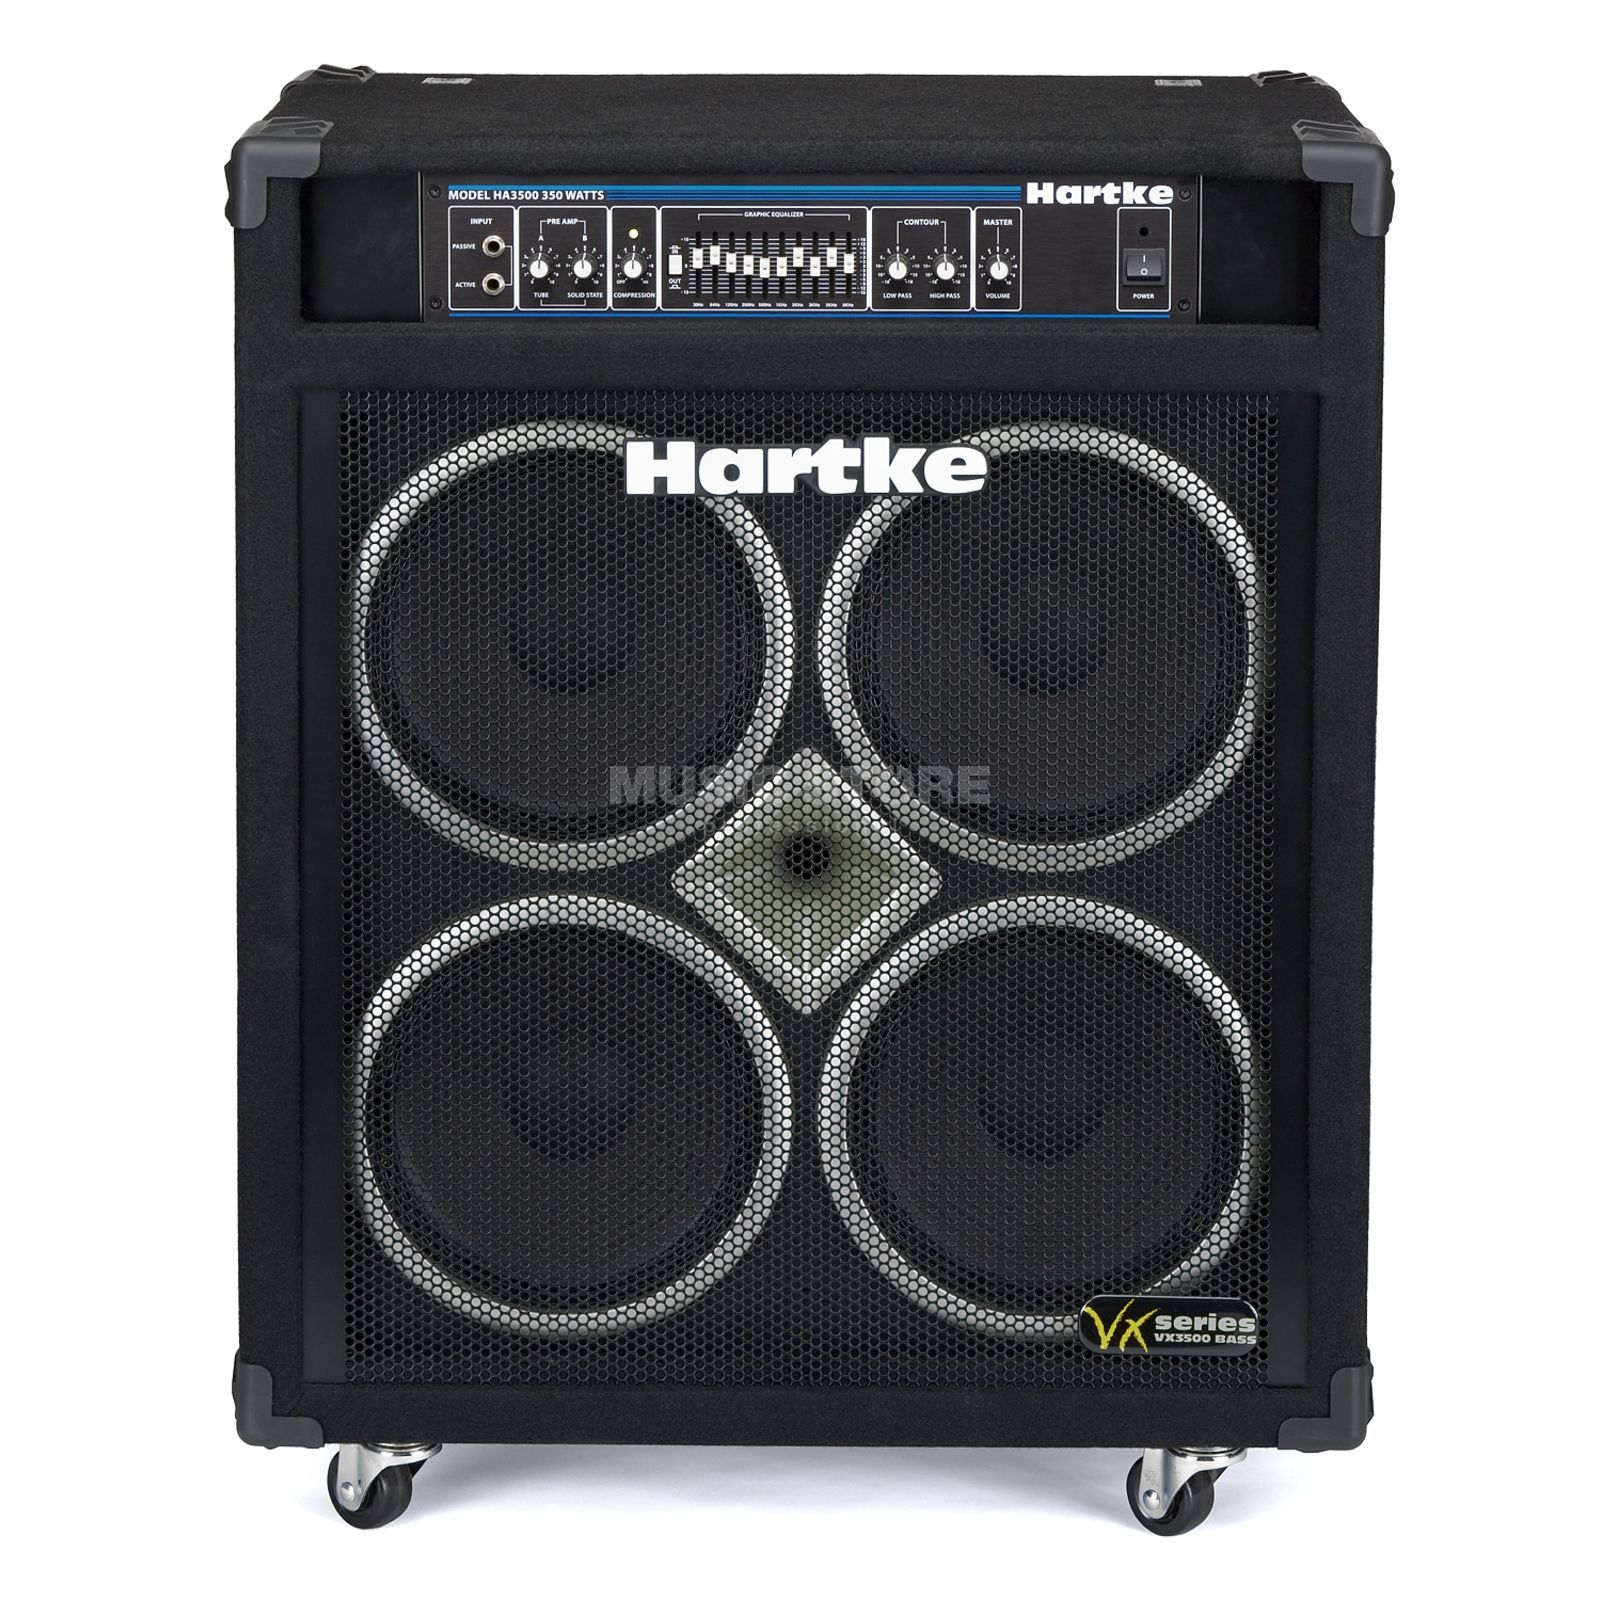 Hartke A100 - Primeiras impressões Hartke-vx3500-bass-guitar-amp-combo-b-stock_1_BAS0002108-000